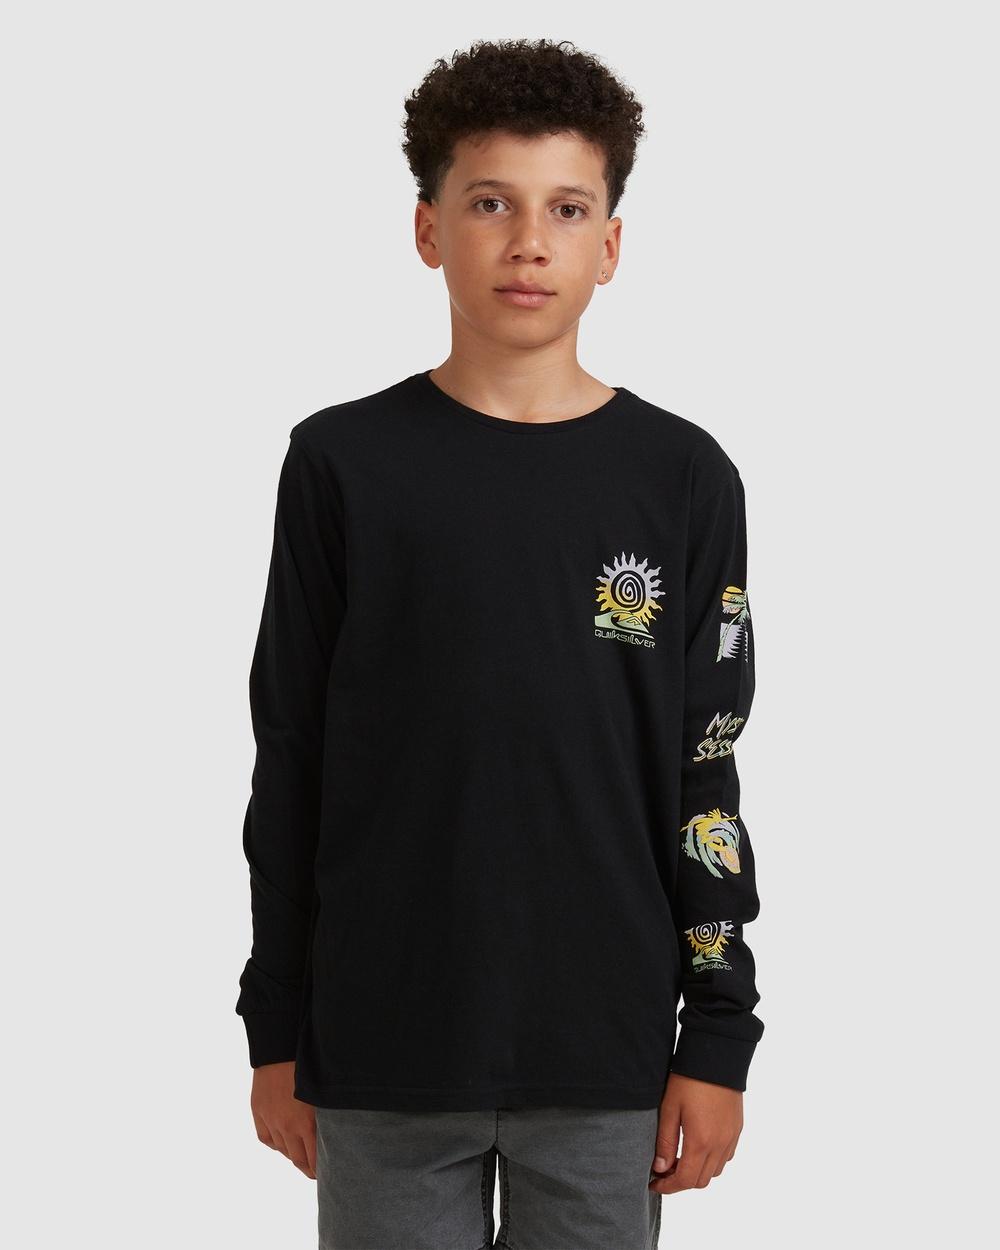 Quiksilver - Boys 8 16 Island Pulse Long Sleeve T Shirt - Long Sleeve T-Shirts (Black) Boys 8-16 Island Pulse Long Sleeve T-Shirt